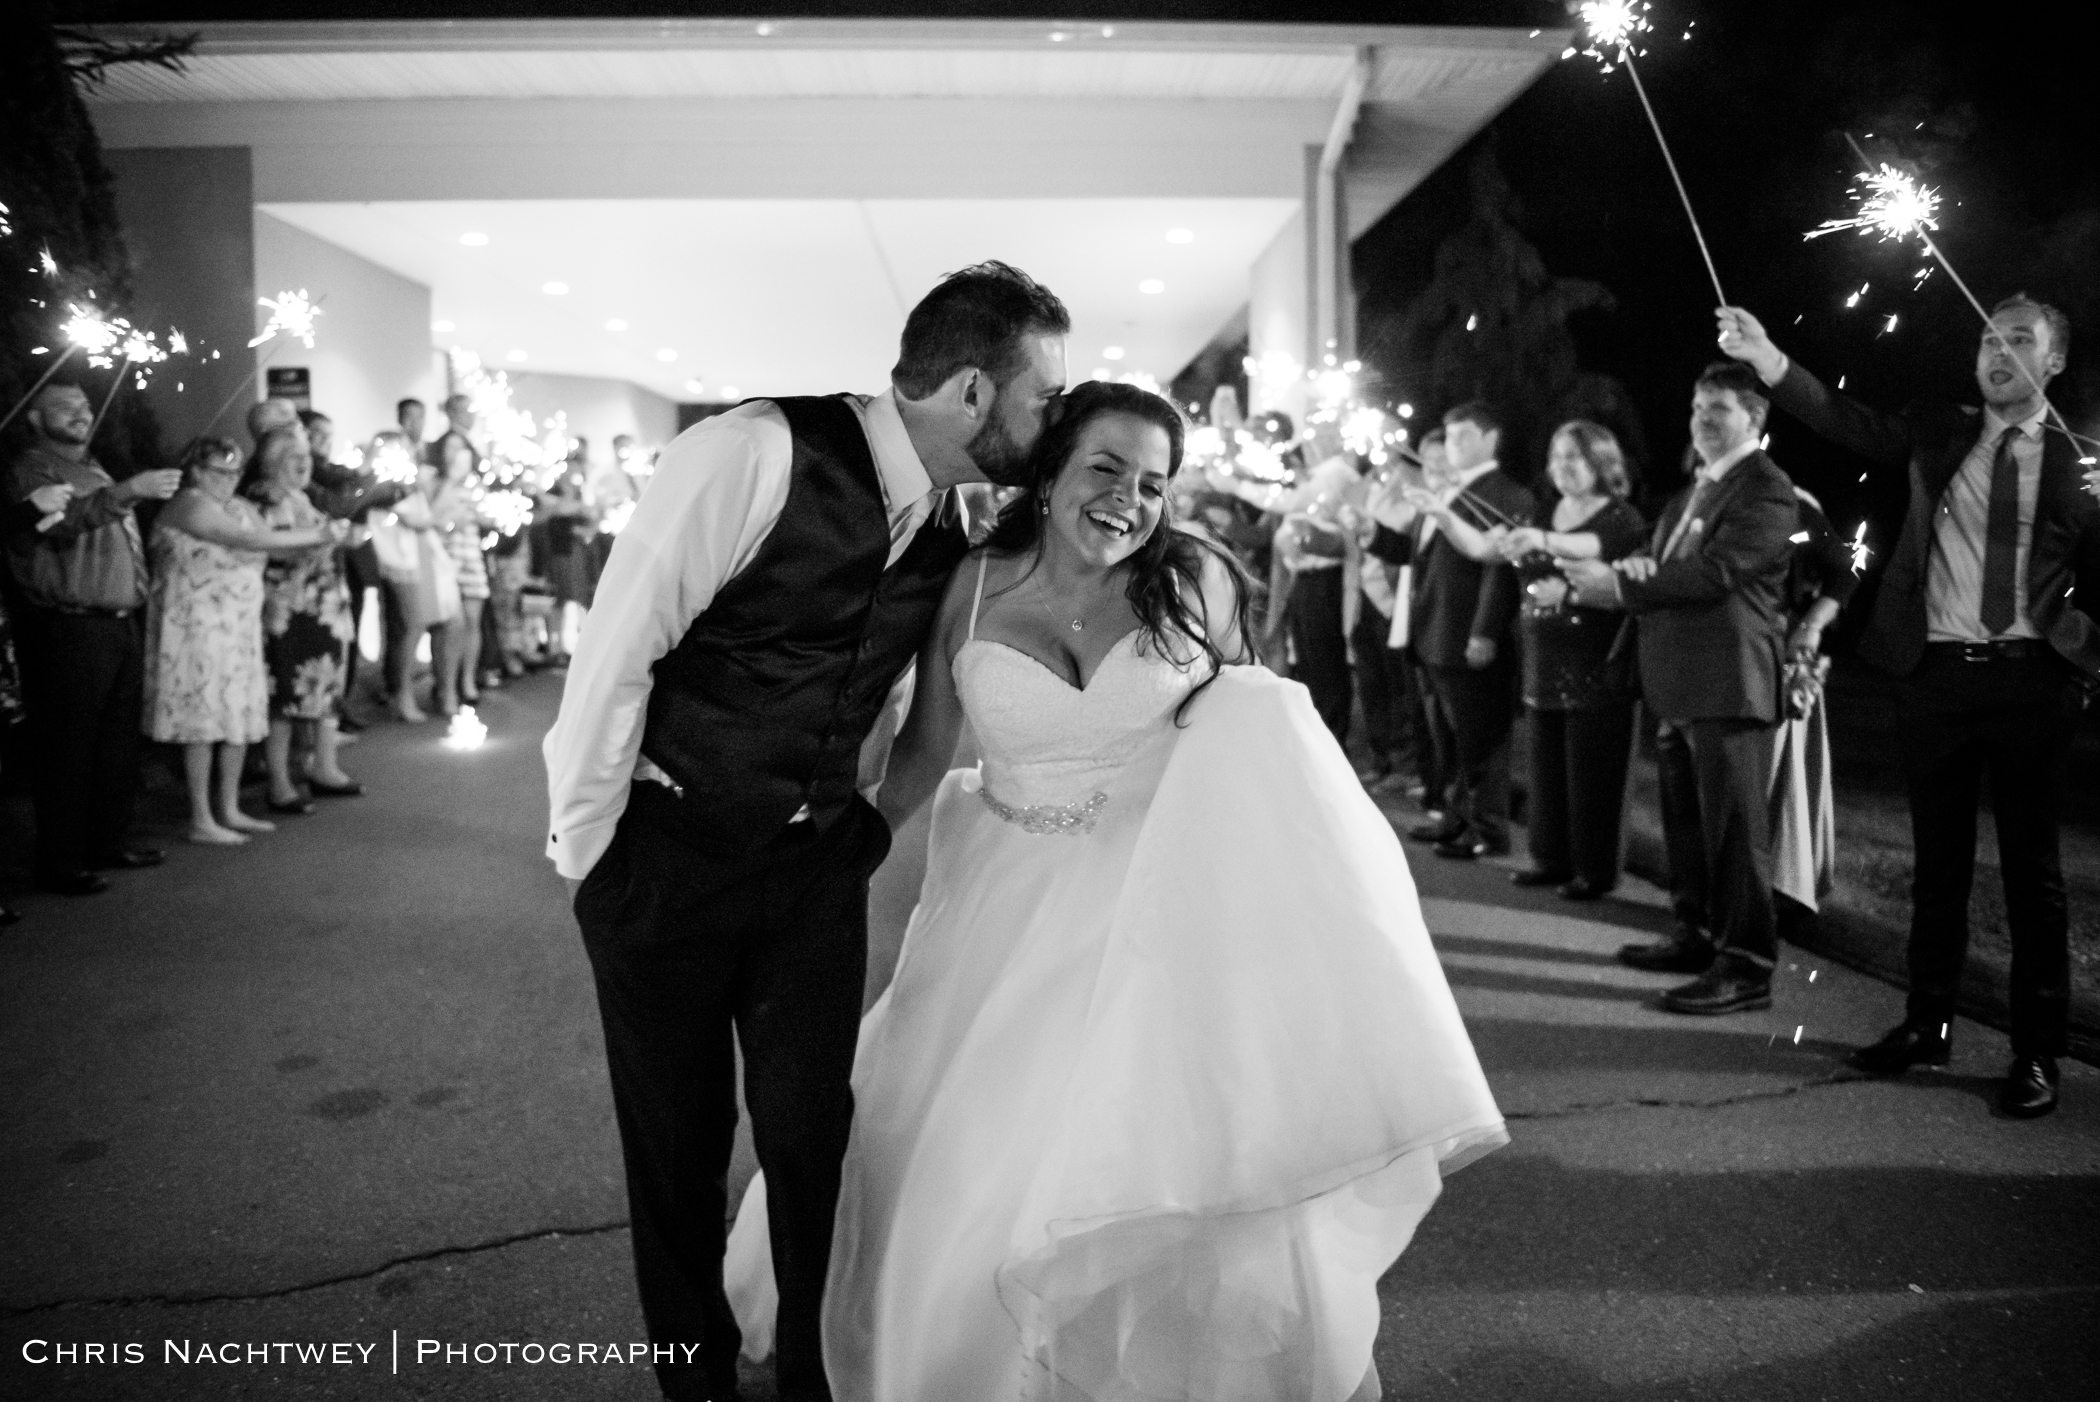 artistic-ct-wedding-photographers-chris-nachtwey-2017-110.jpg